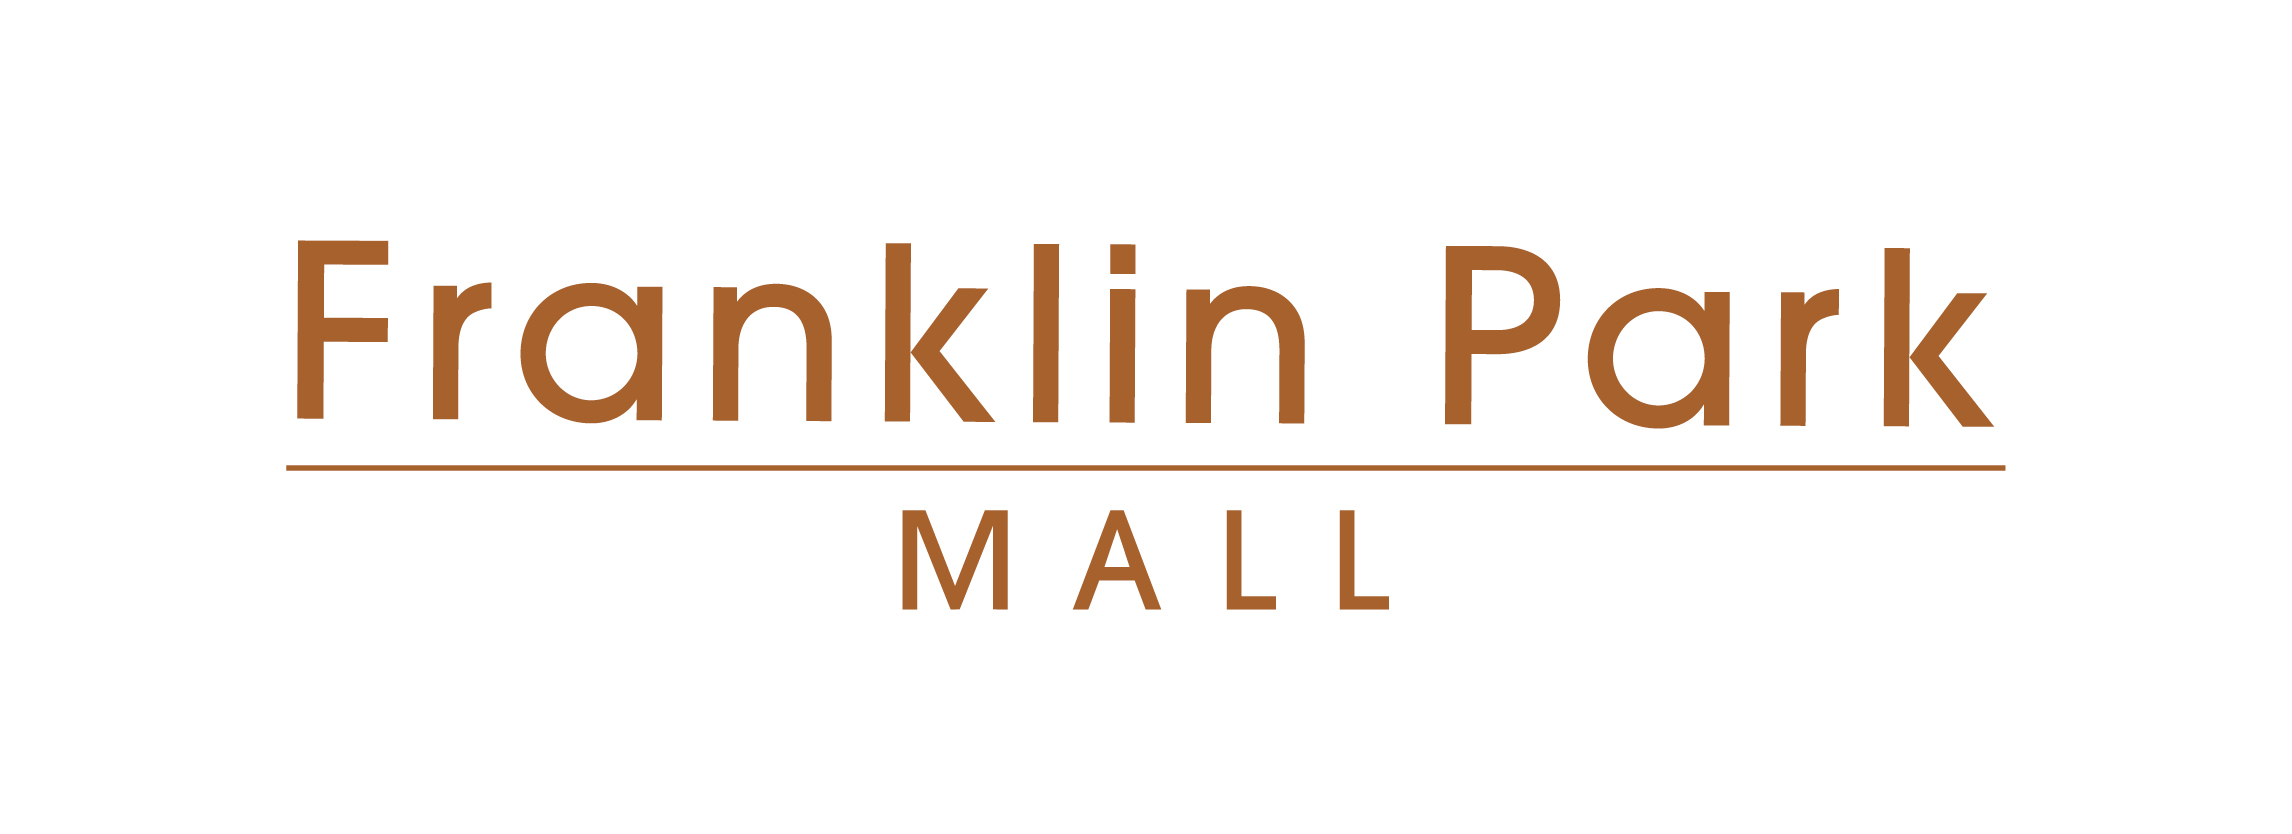 Franklin Park Mall